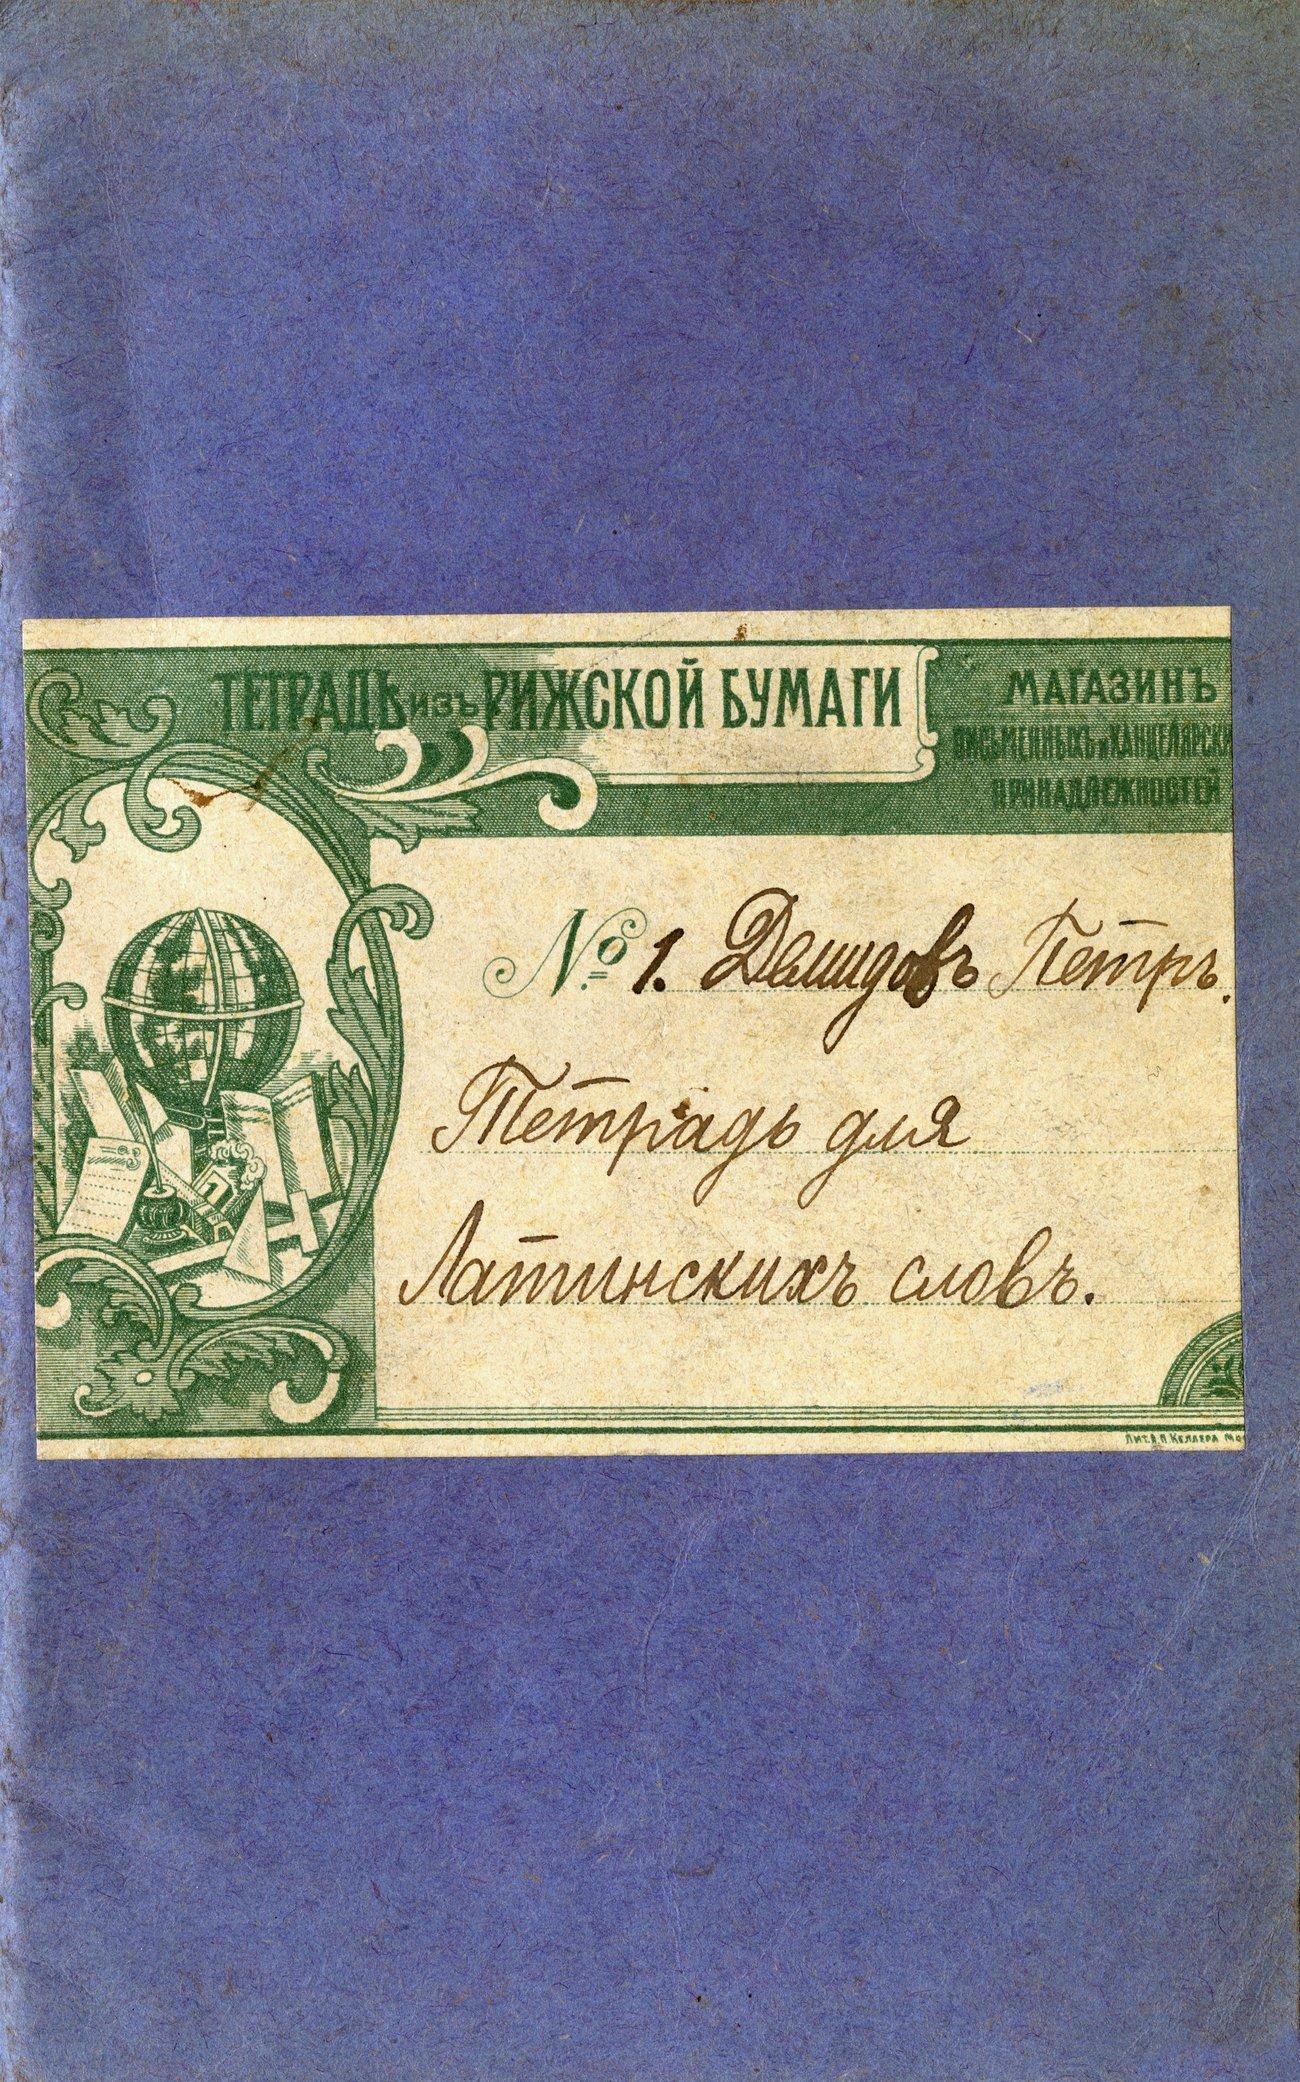 Тетрадь из Рижской бумаги, тип 2, 110х178